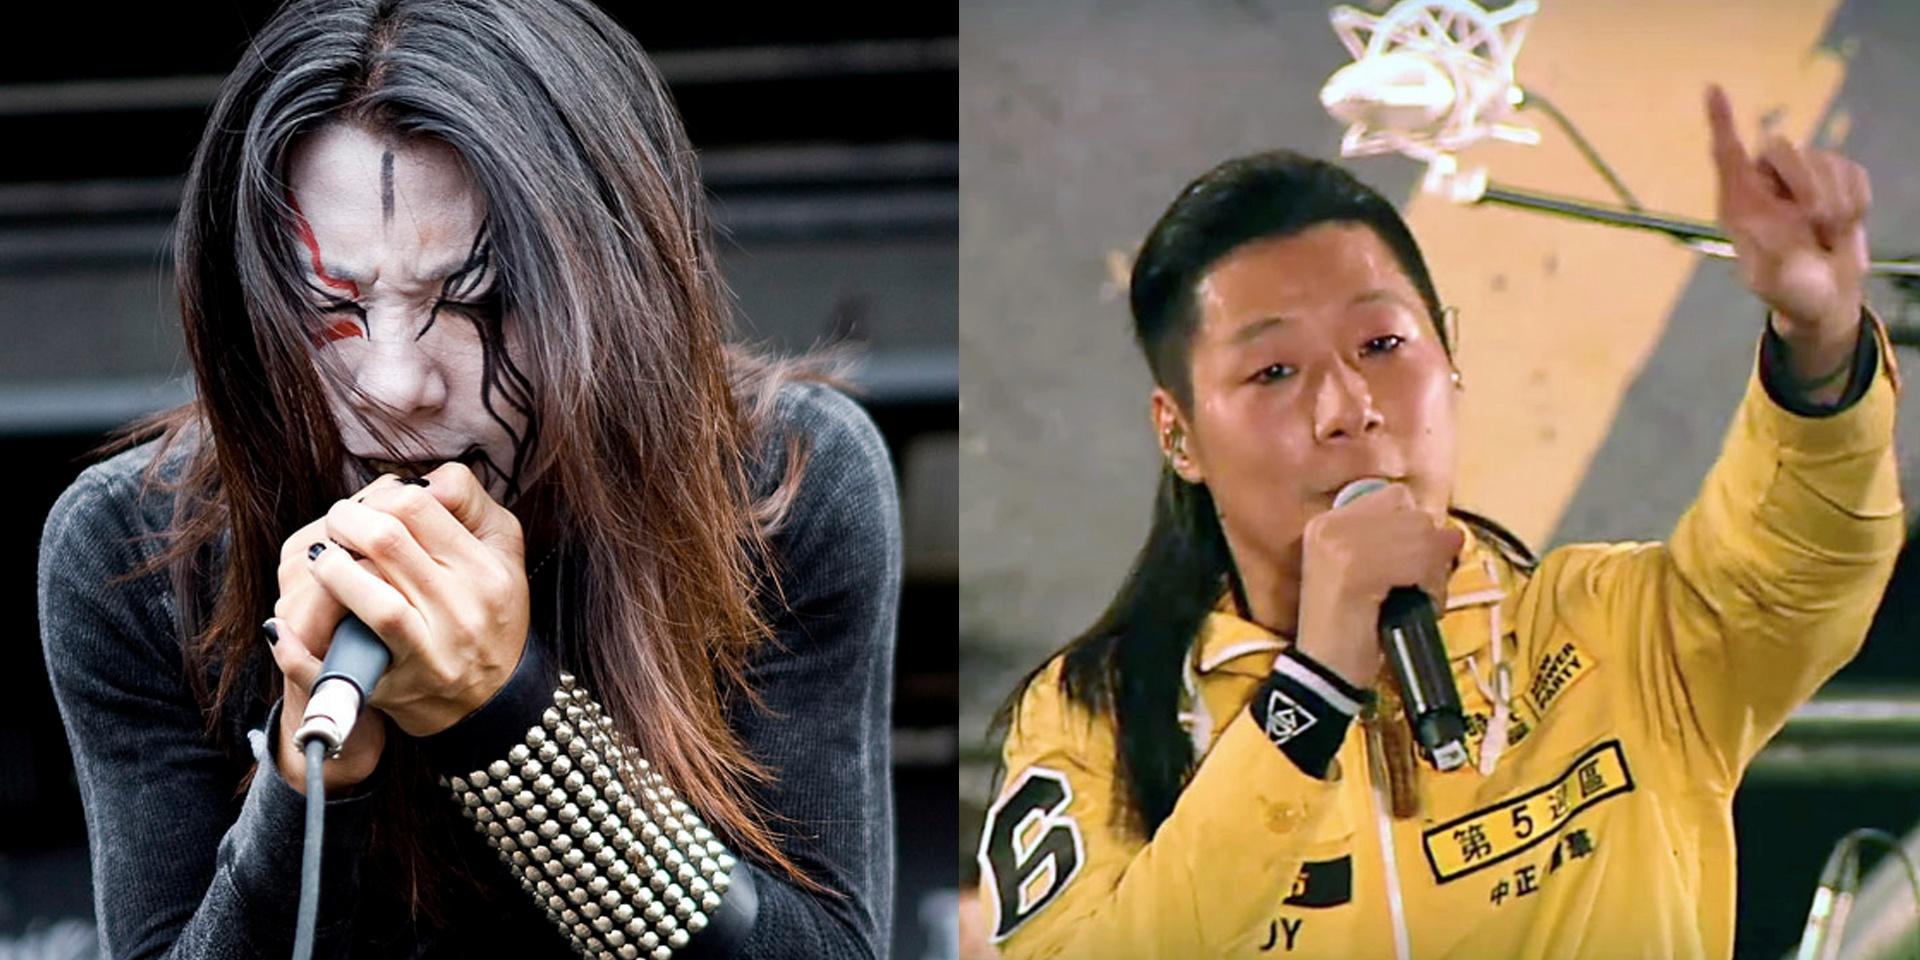 Chthonic frontman Freddy Lim is now a legislator in Taiwan